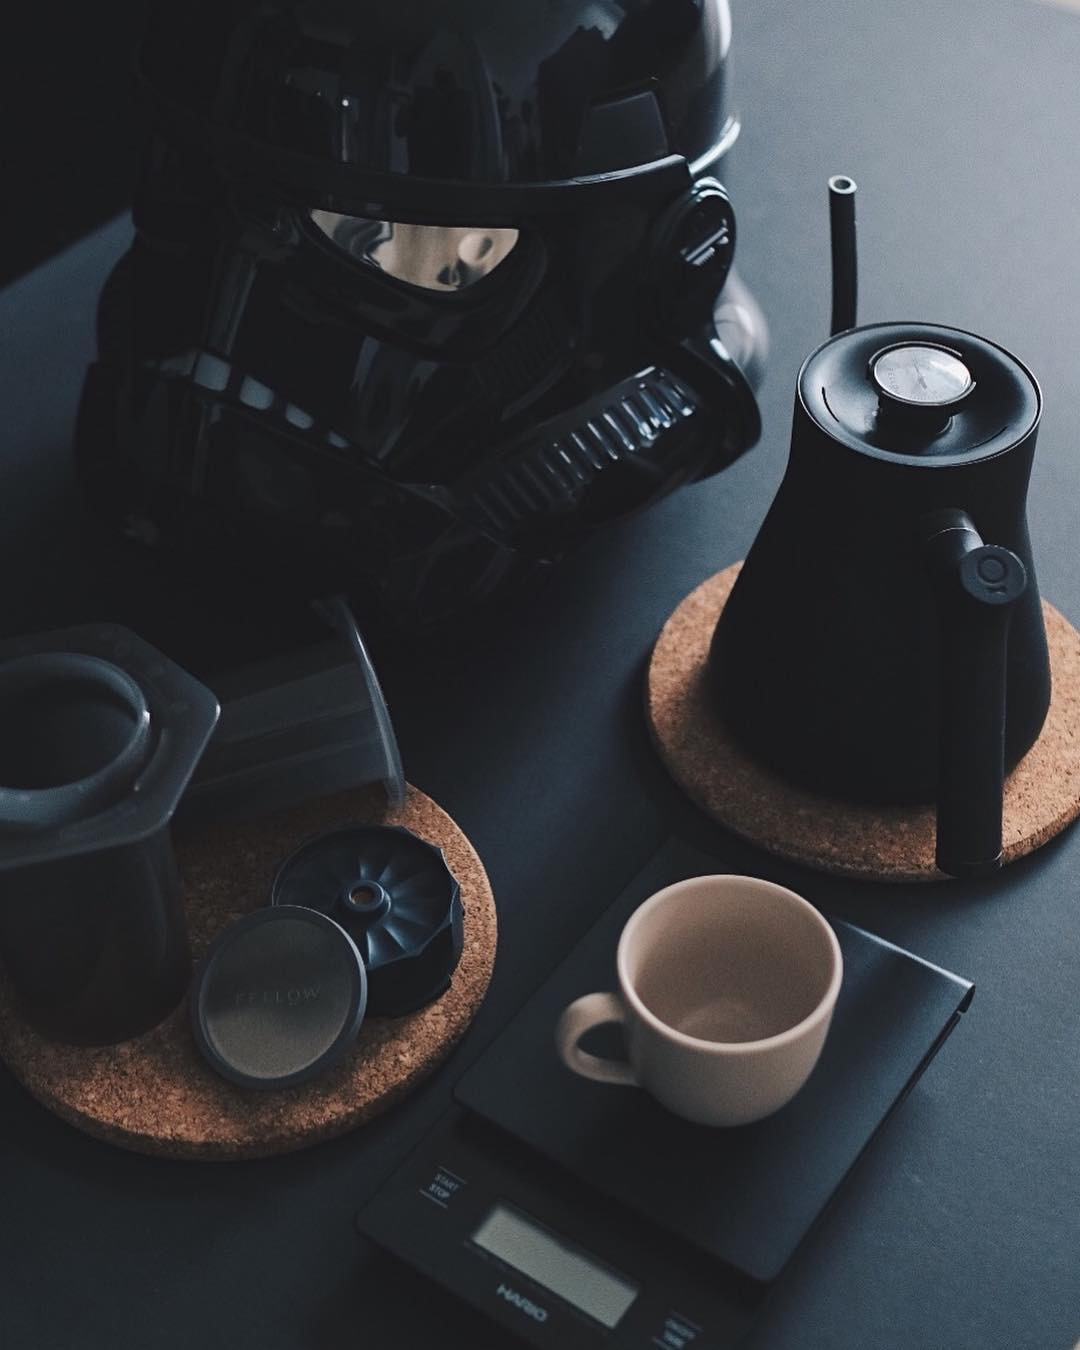 matte-black-coffee-gear-epilogue-stormtrooper-bhagas-nissreyasa